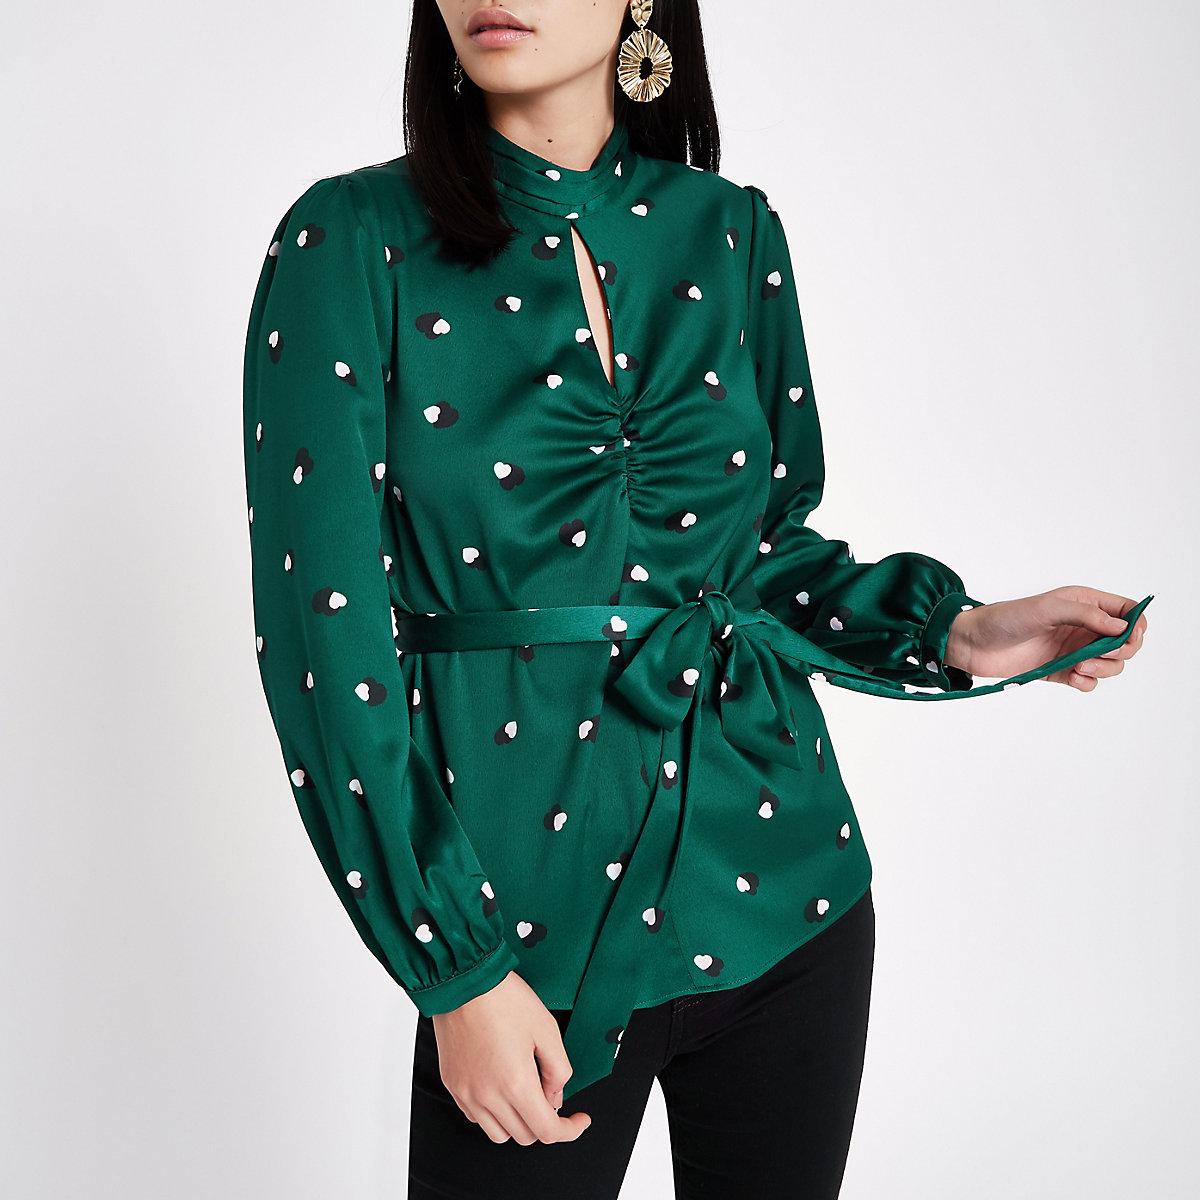 Teal green satin print tie waist top